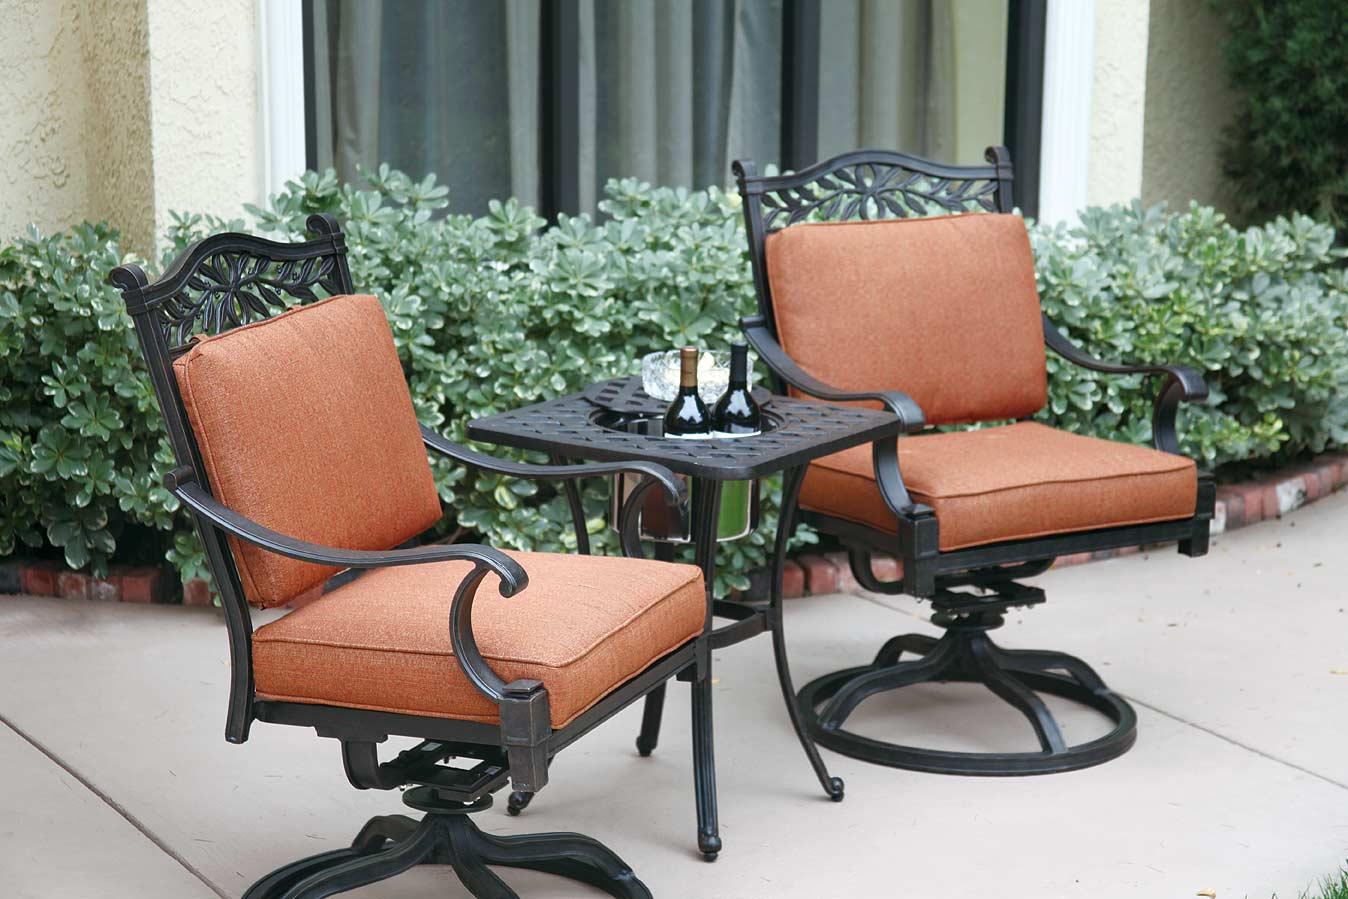 patio furniture bistro set cast aluminum swivel rocker 3pc charleston